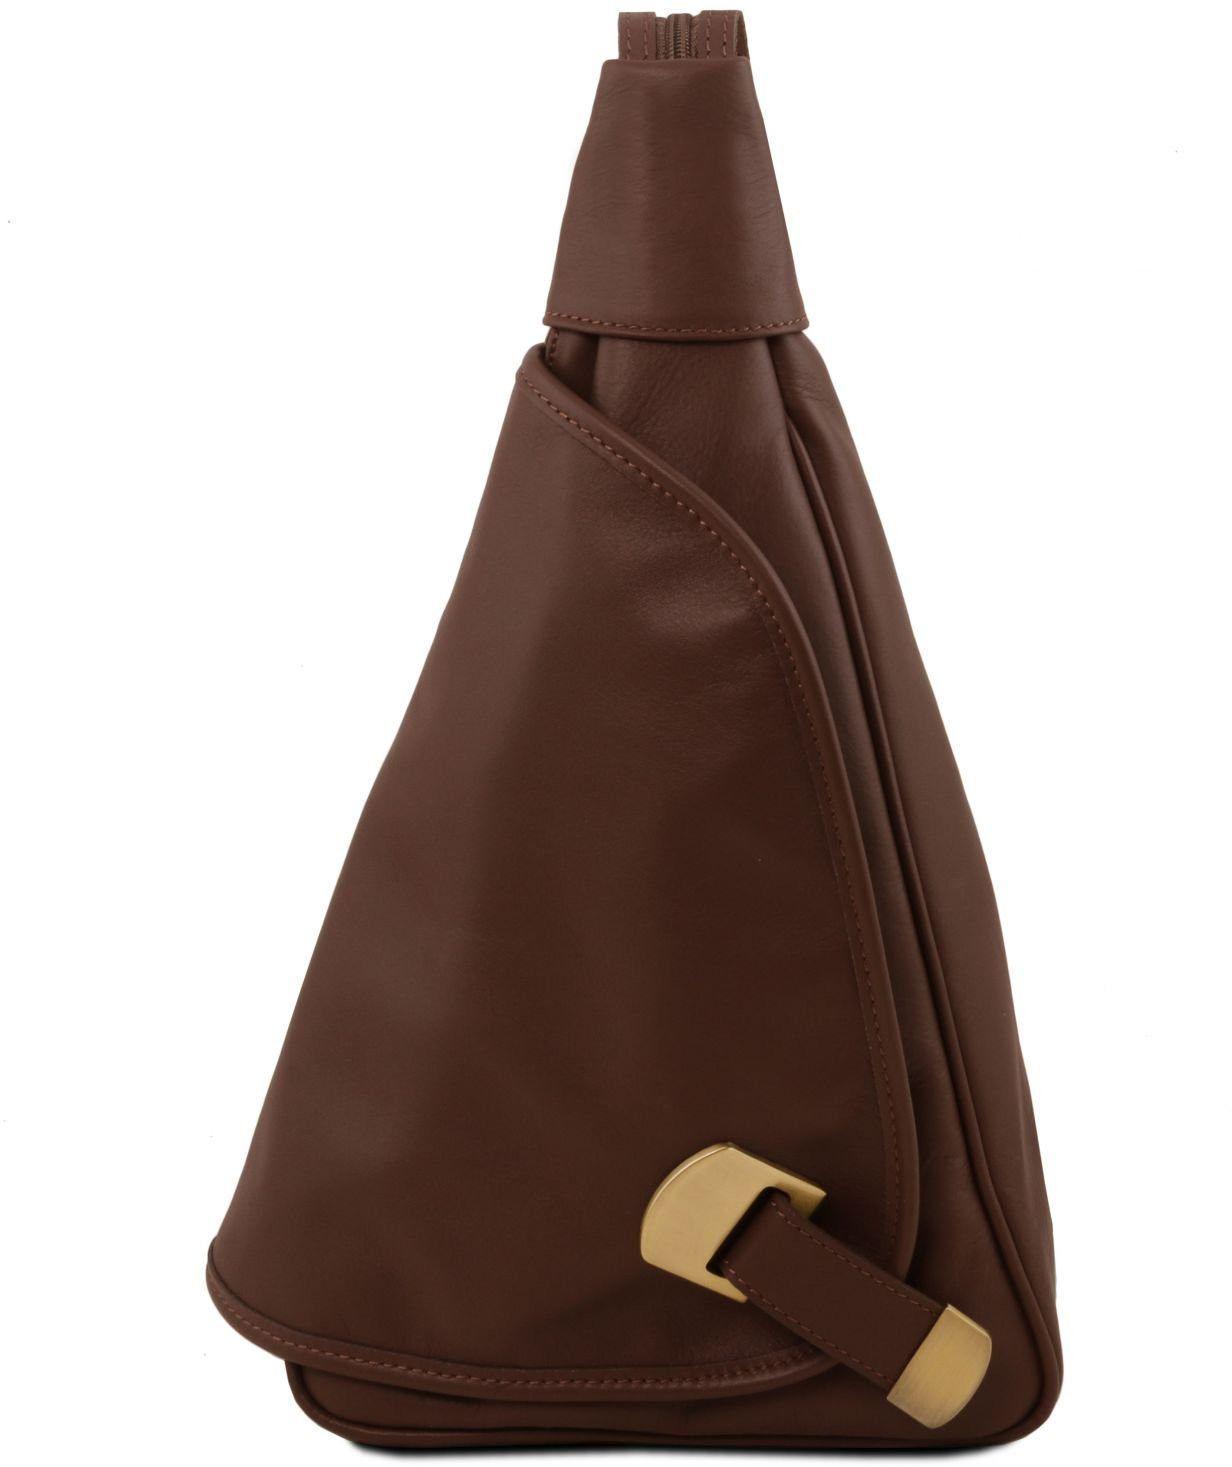 e78a2d768e Γυναικείο Τσαντάκι Δερμάτινο Hanoi Καφέ σκούρο Tuscany Leather